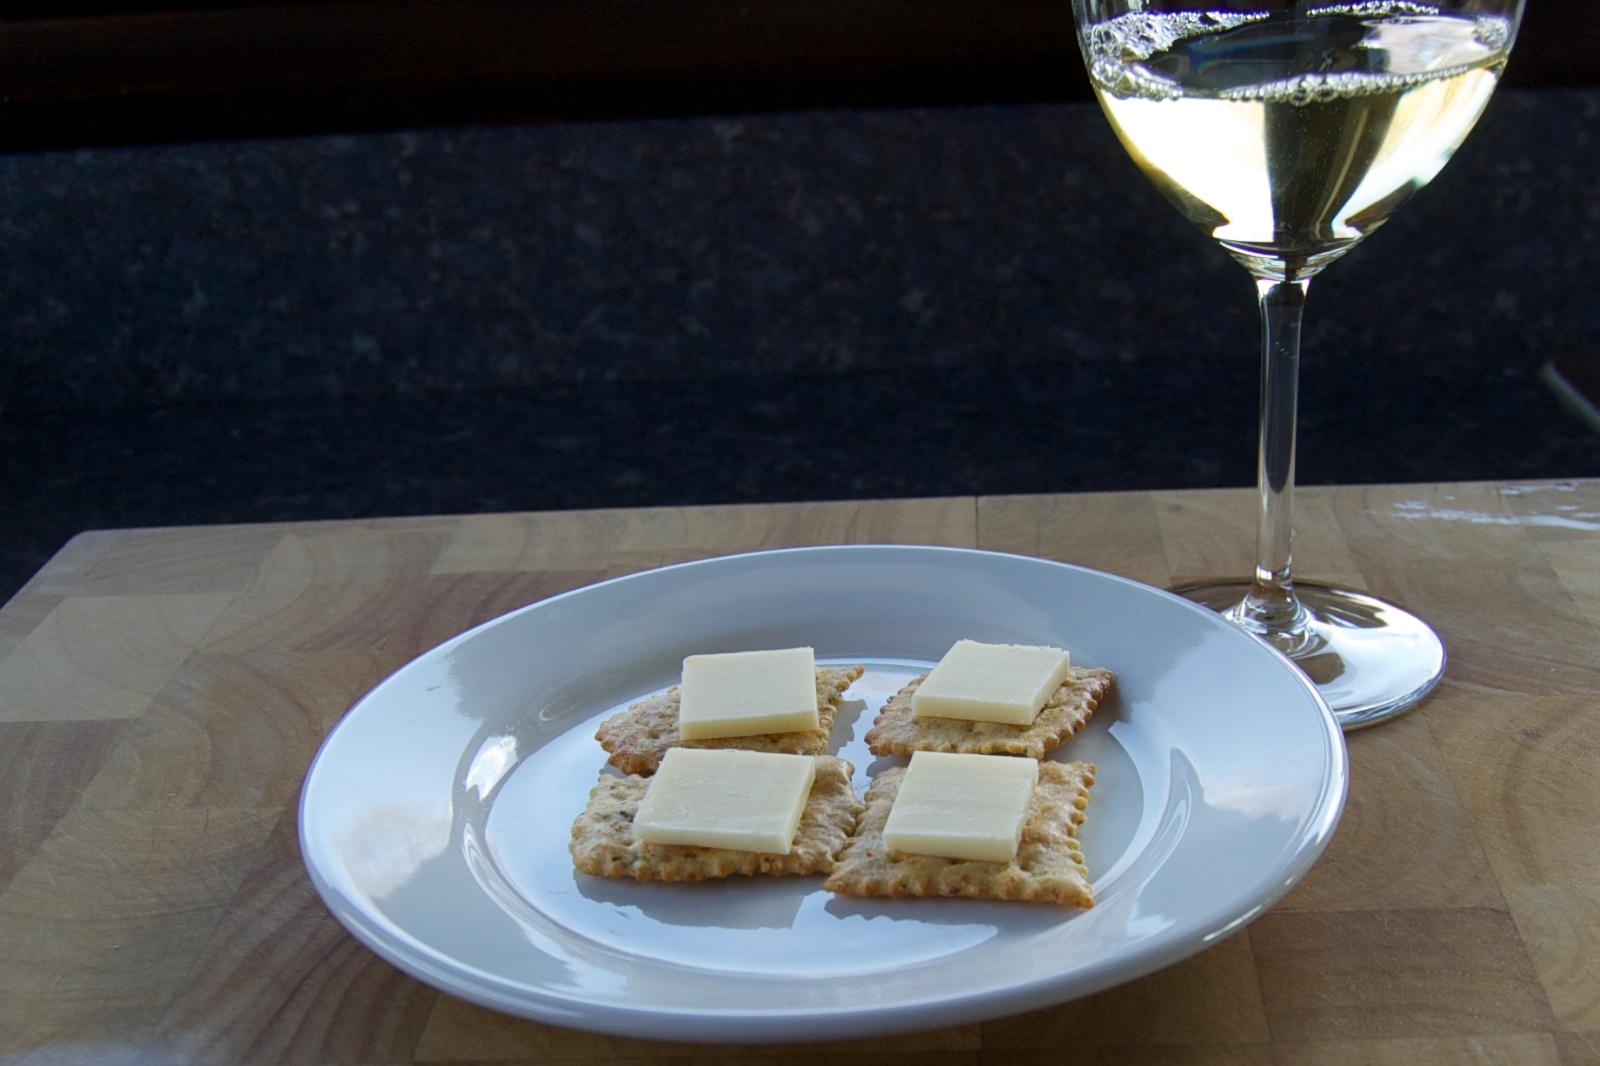 http://blog.rickk.com/food/2012/03/18/ate.2012.03.18.s.jpg